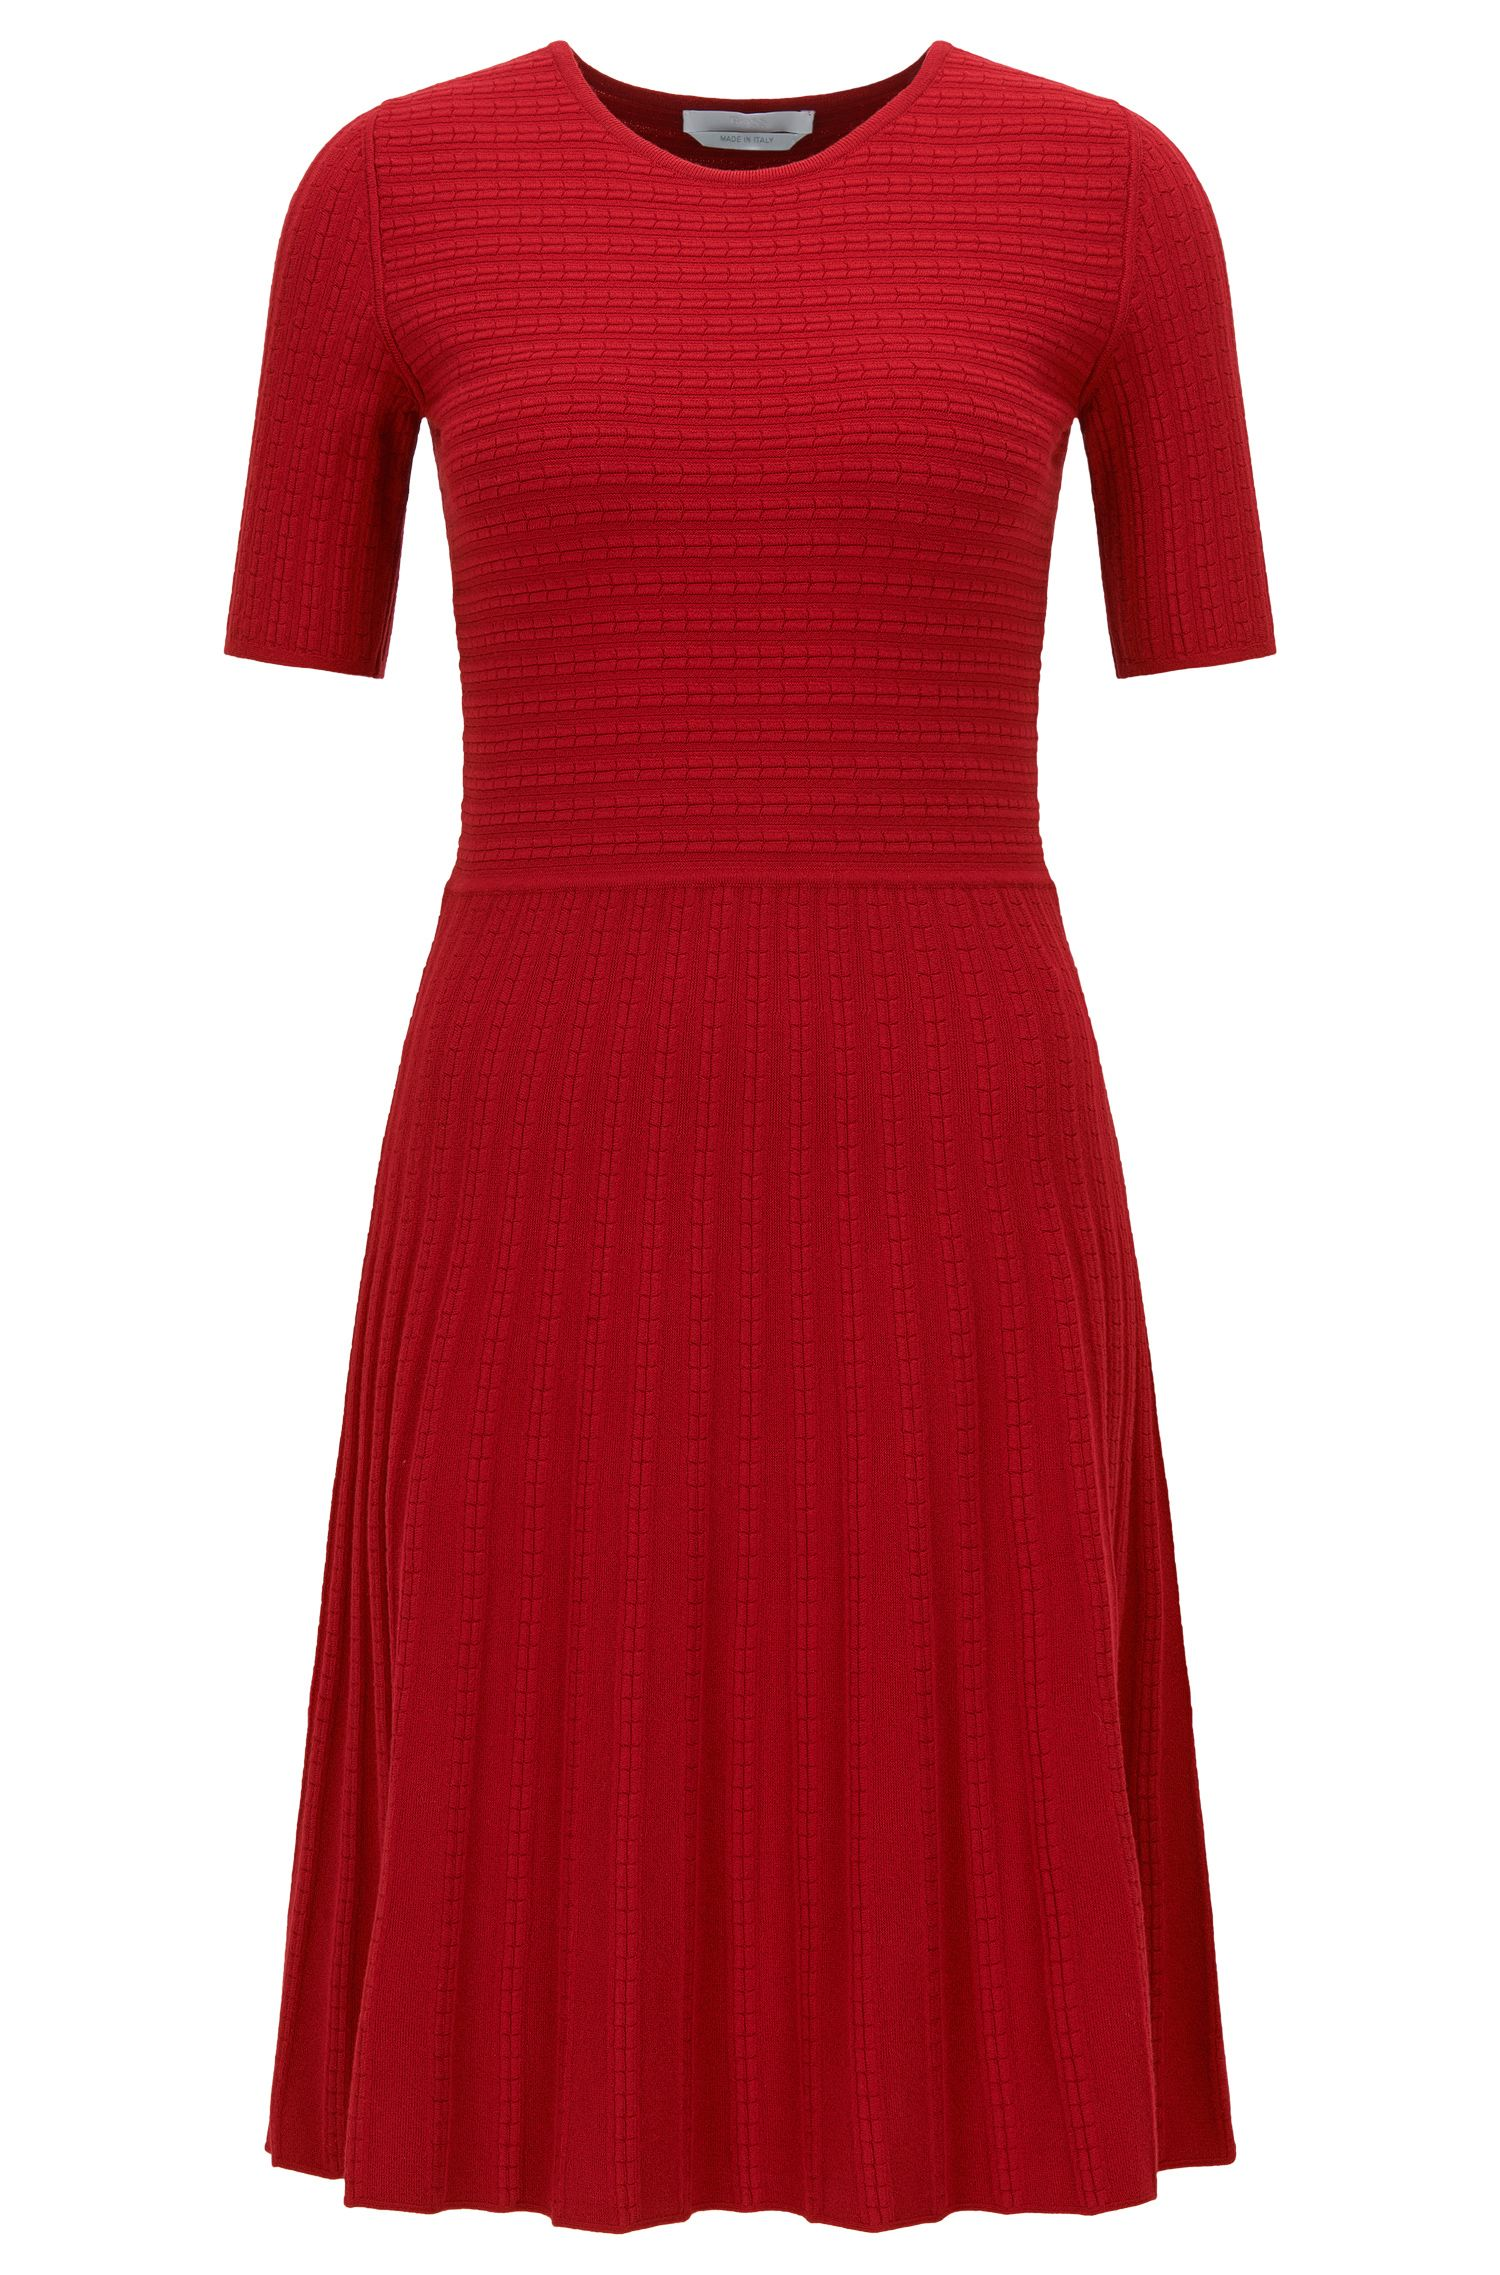 A-line dress in Italian stretch fabric